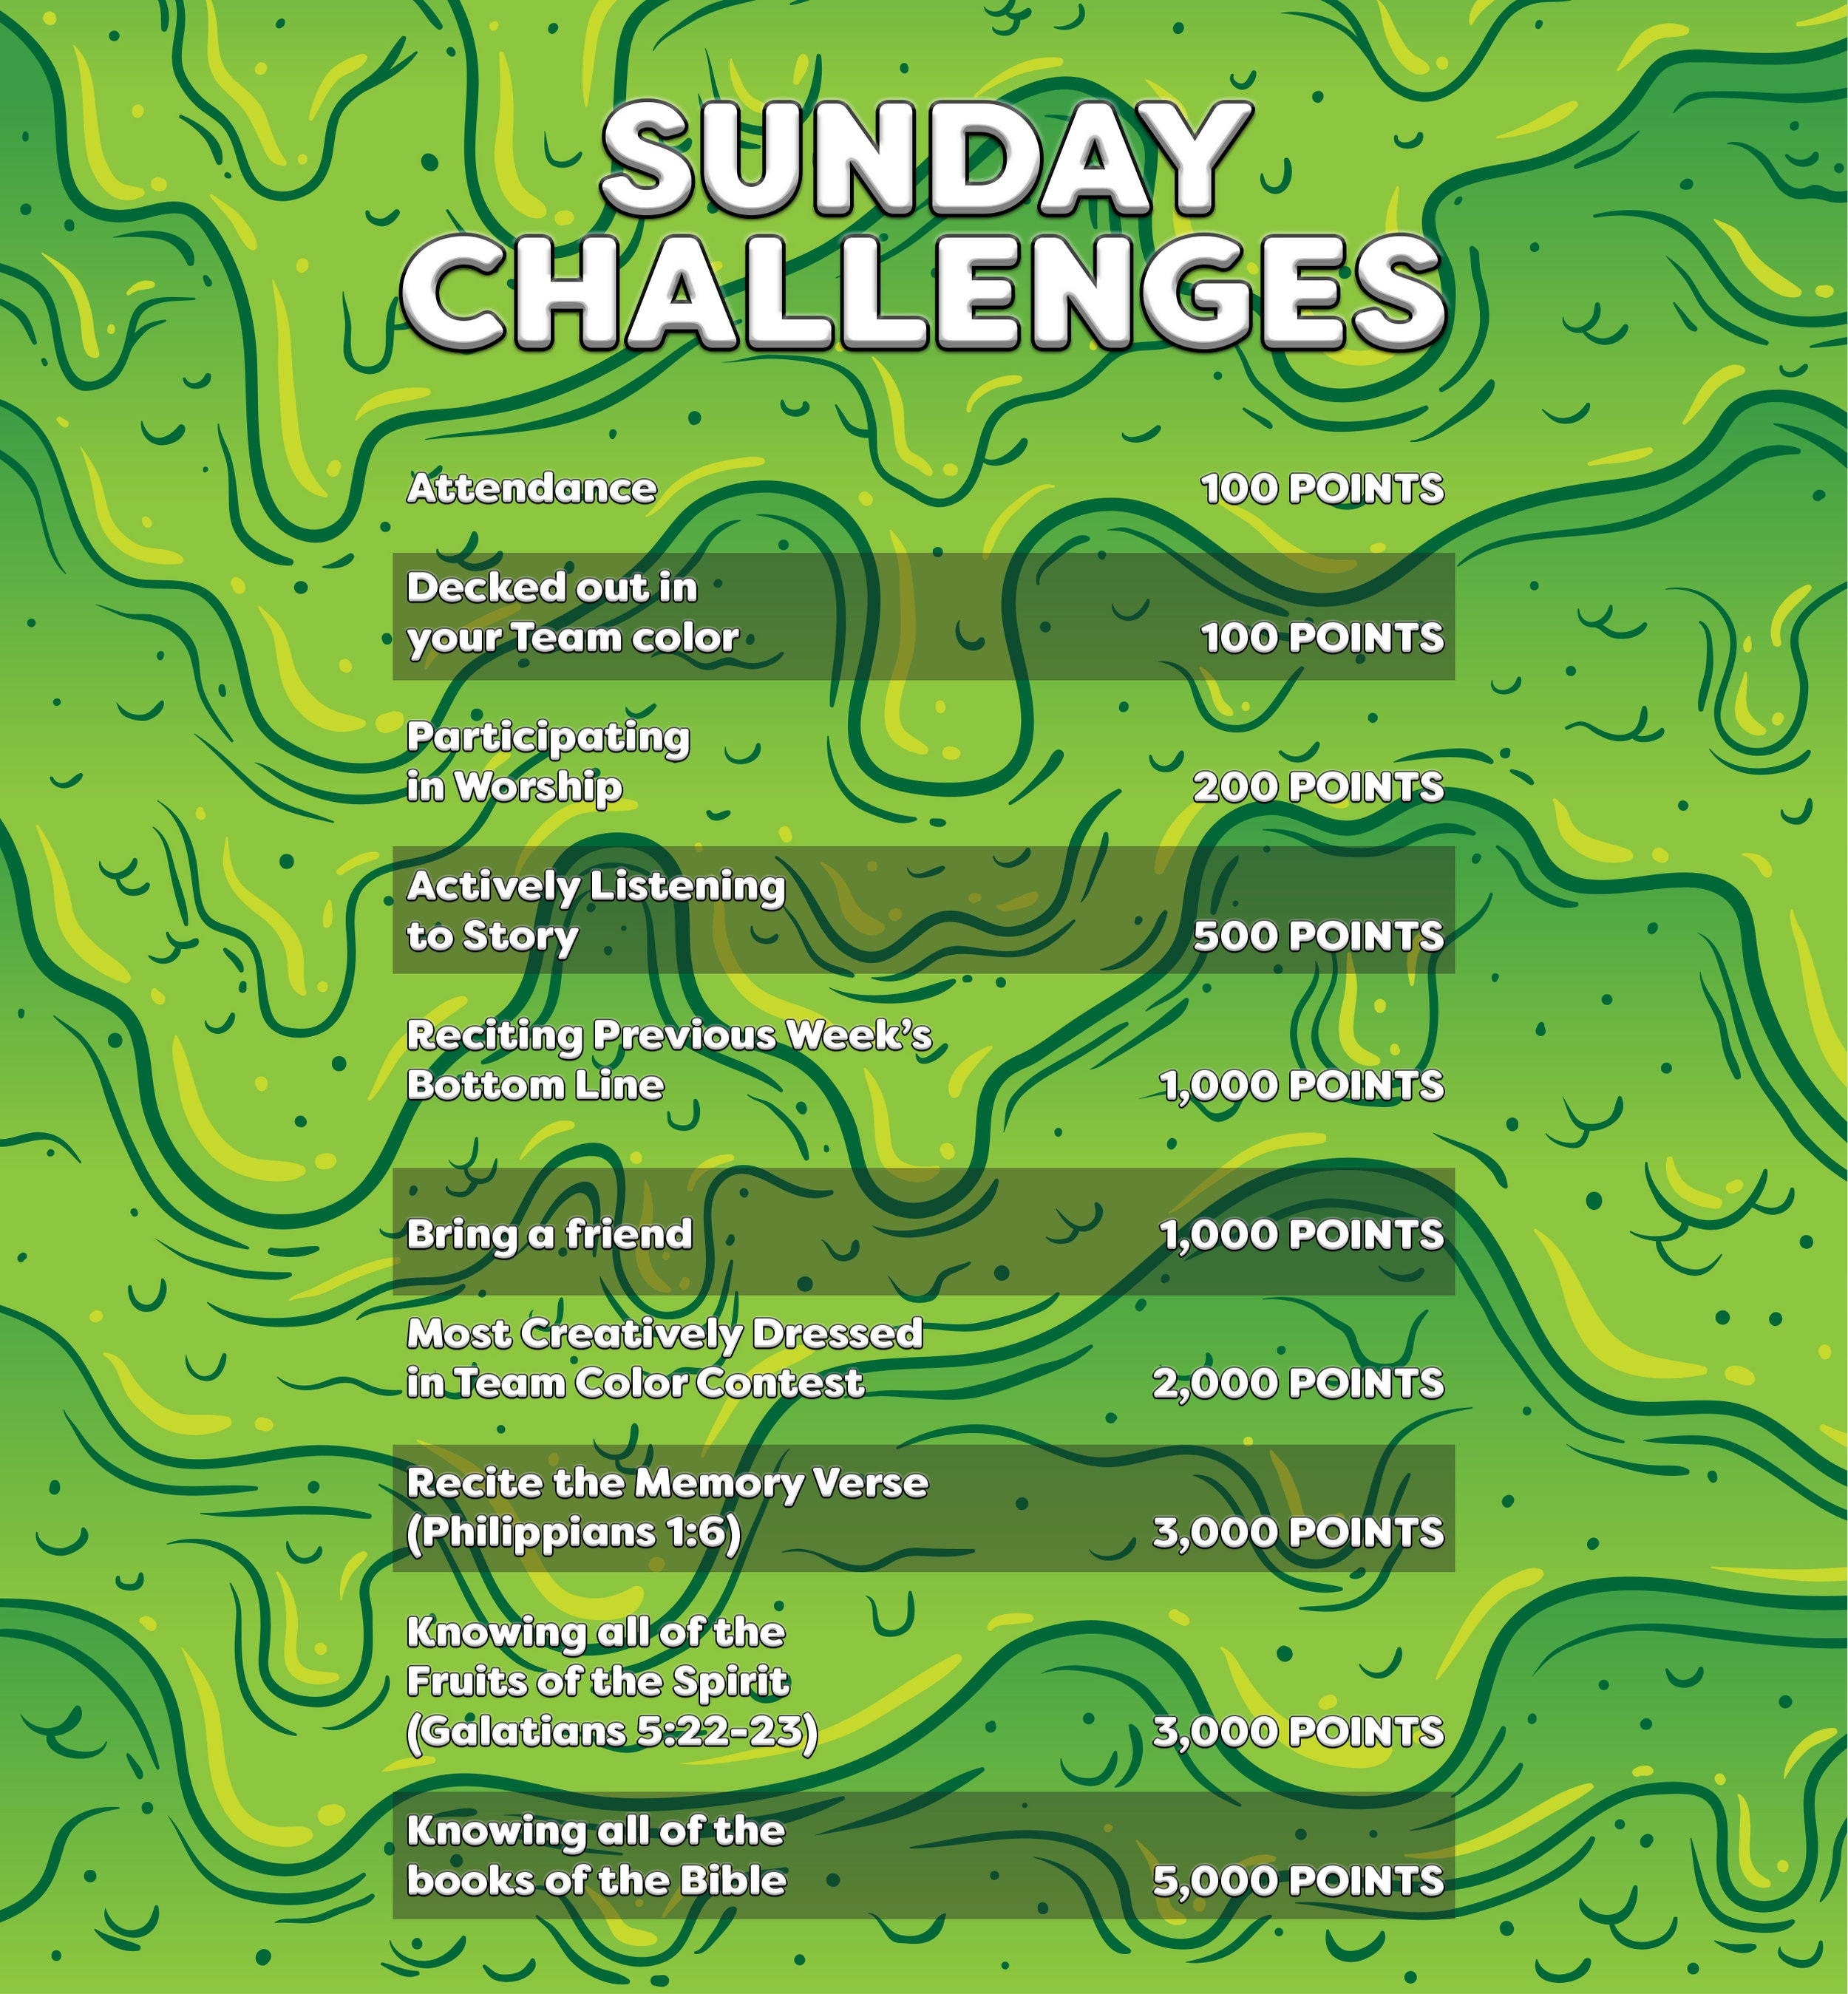 Sunday Challenges 2.jpg